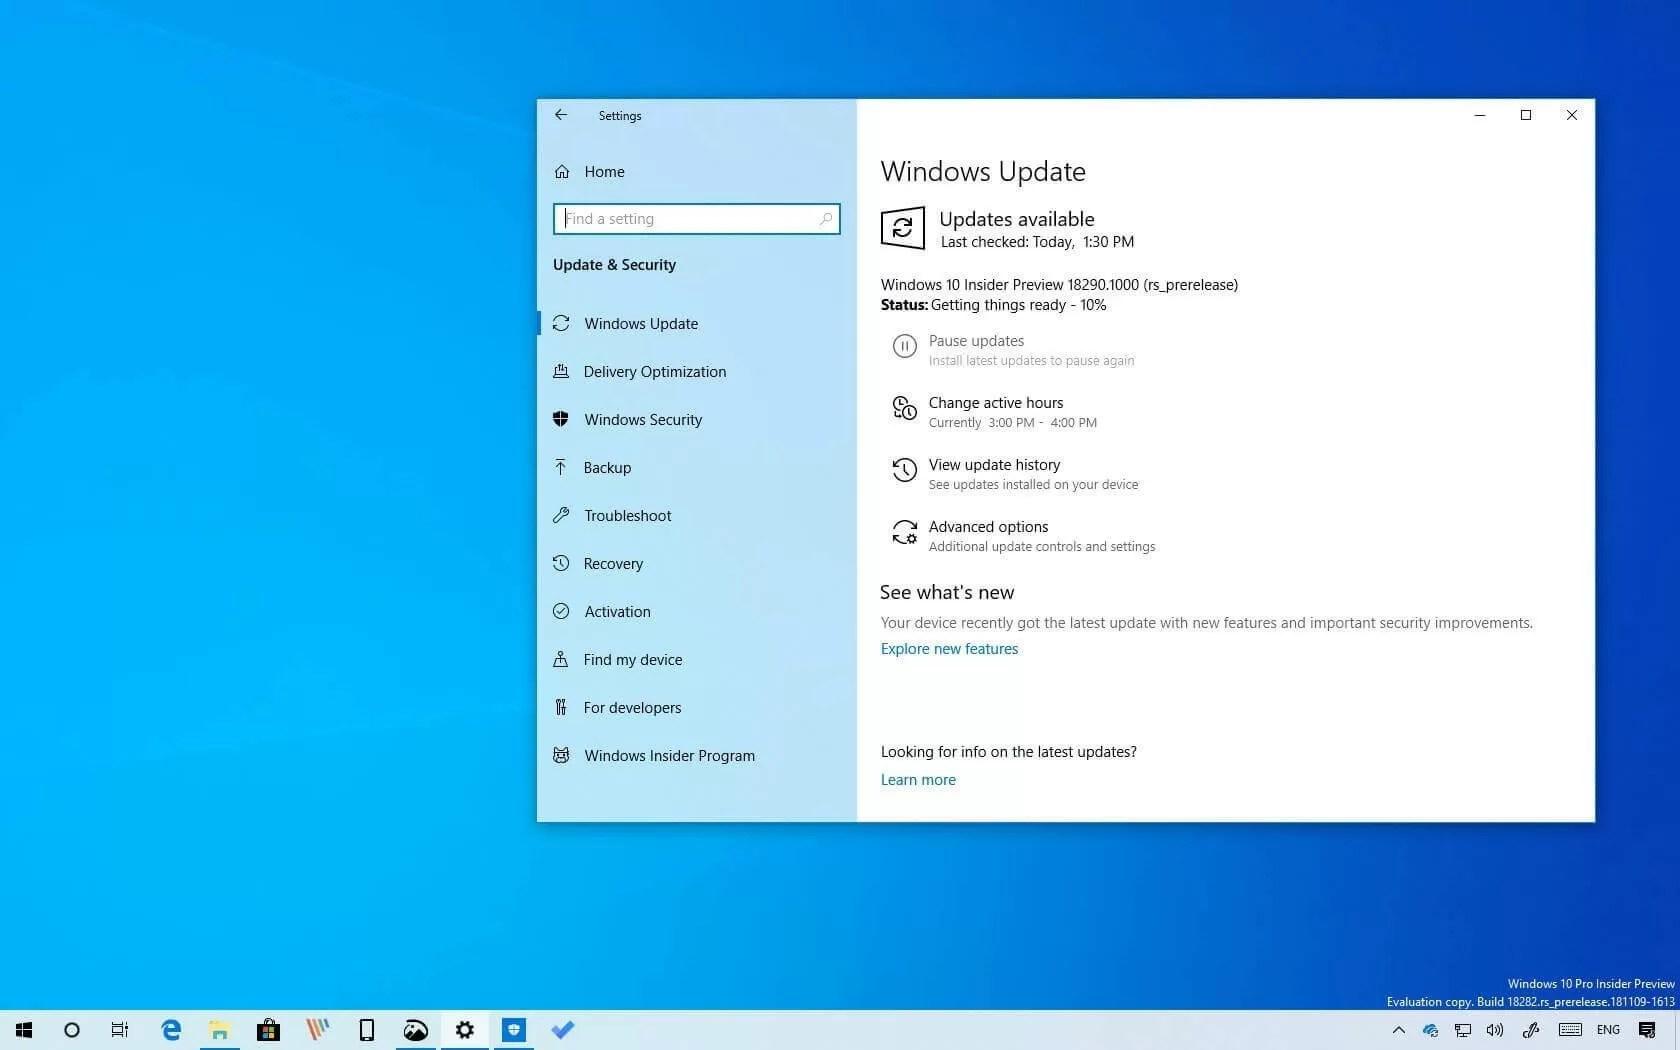 windows updates are at